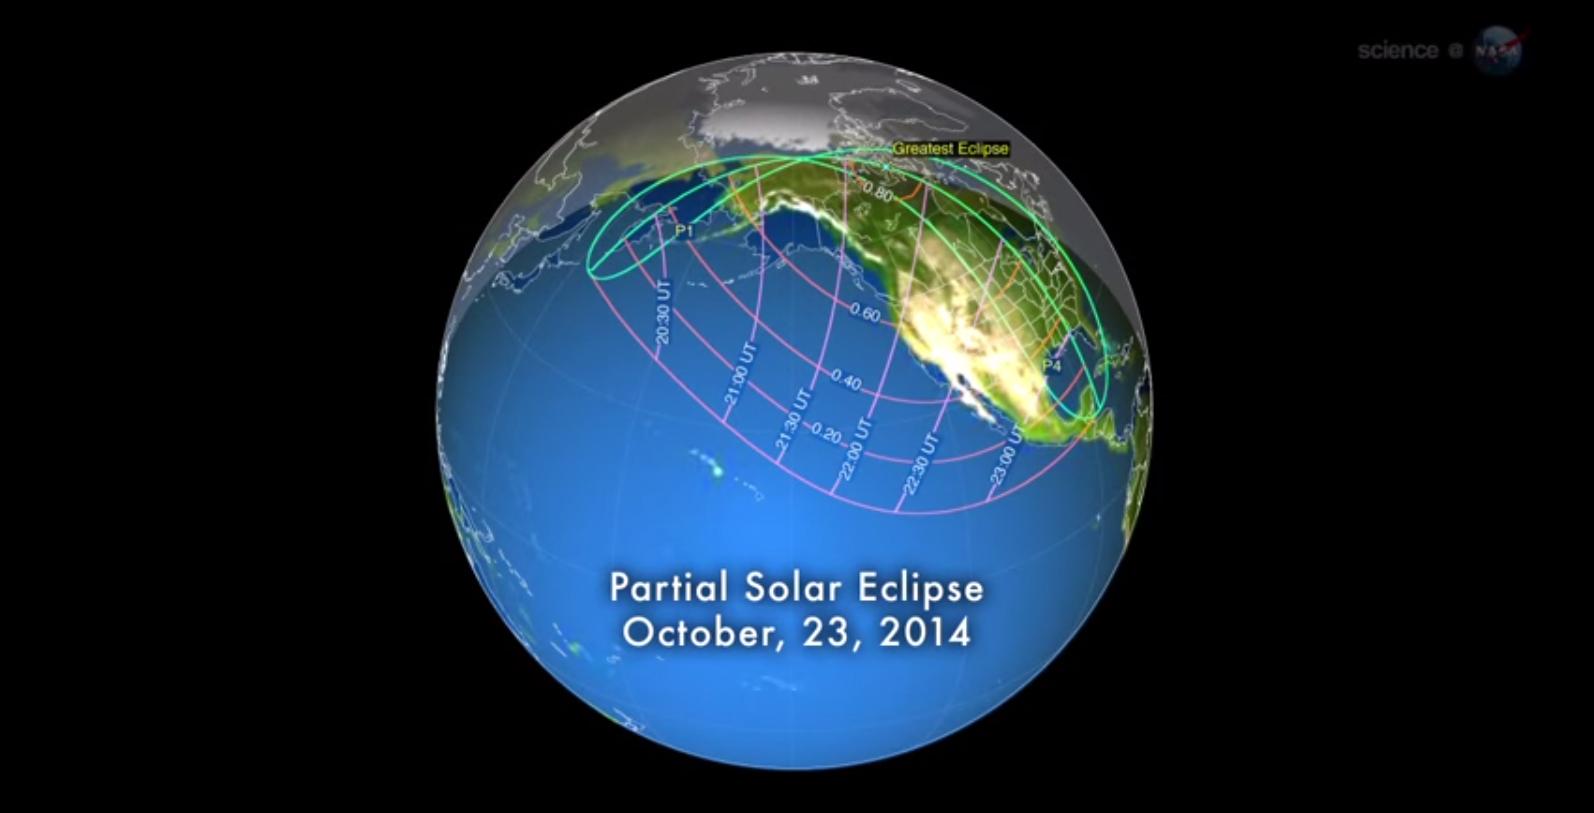 Partial Solar Eclipse Visibility Globe